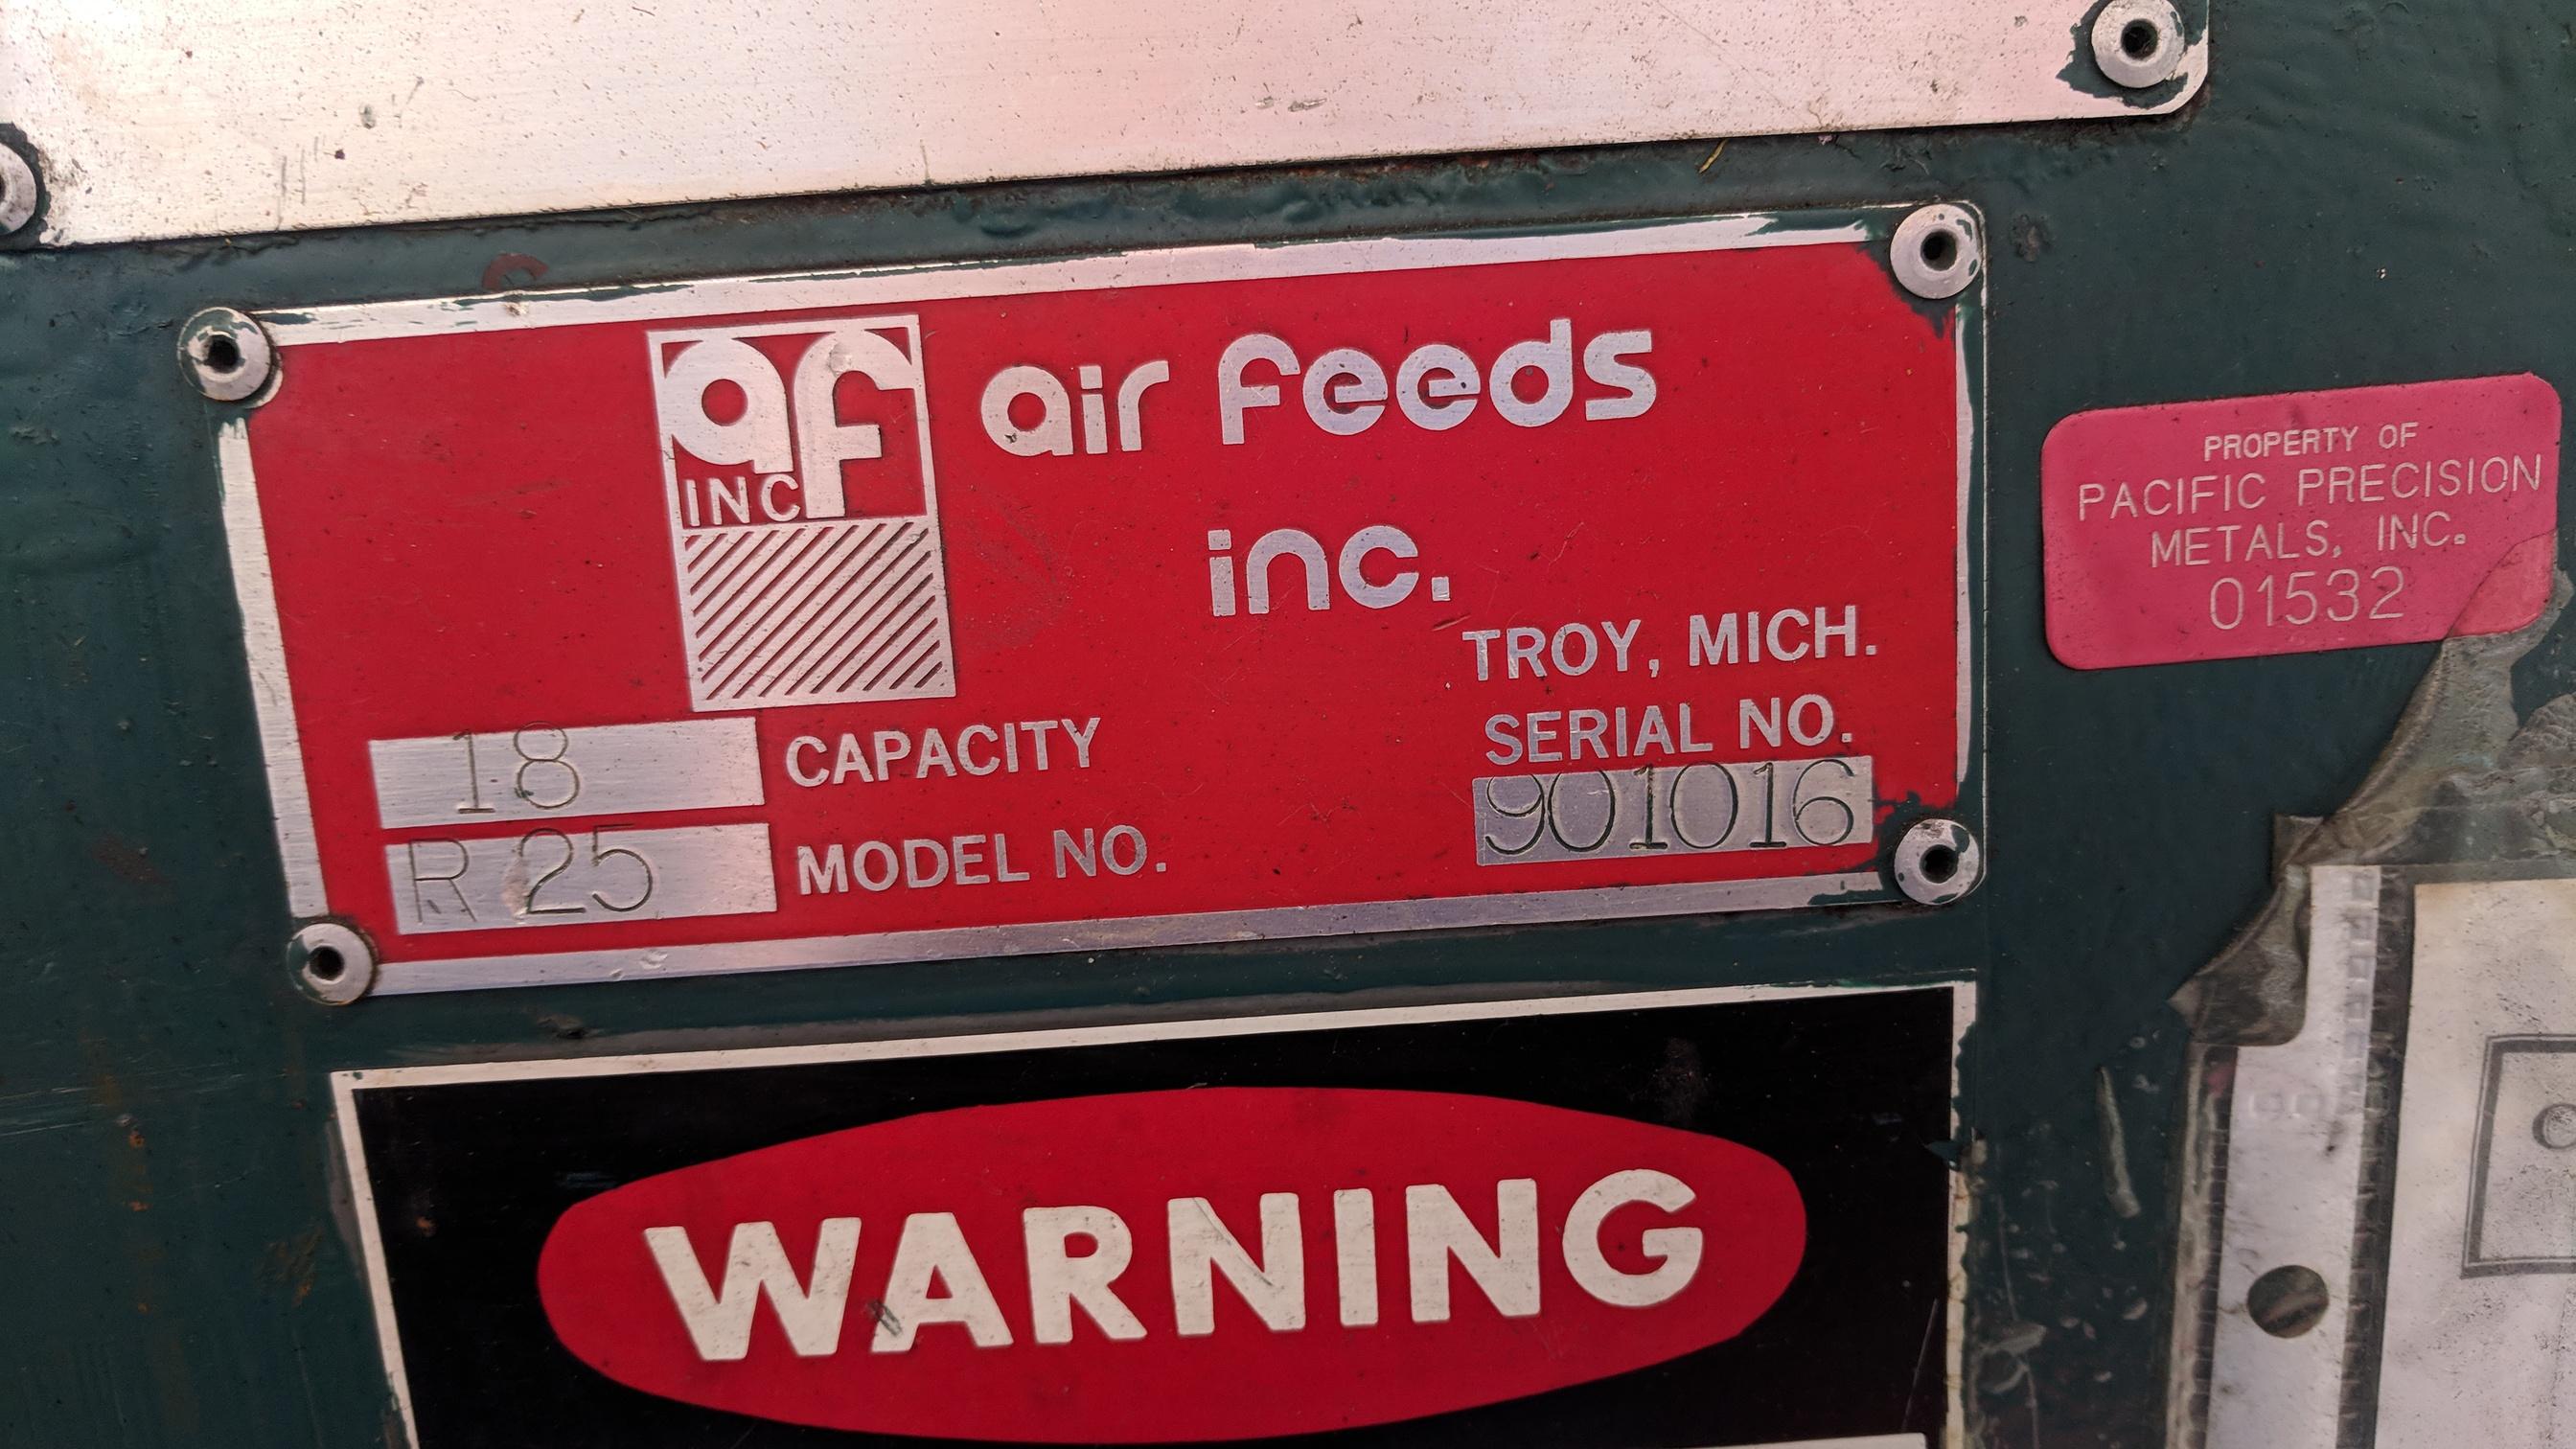 "AIR FEEDS INC R25 18"" CAPACITY UNCOILER, S/N 901016 (CI) - Image 3 of 5"